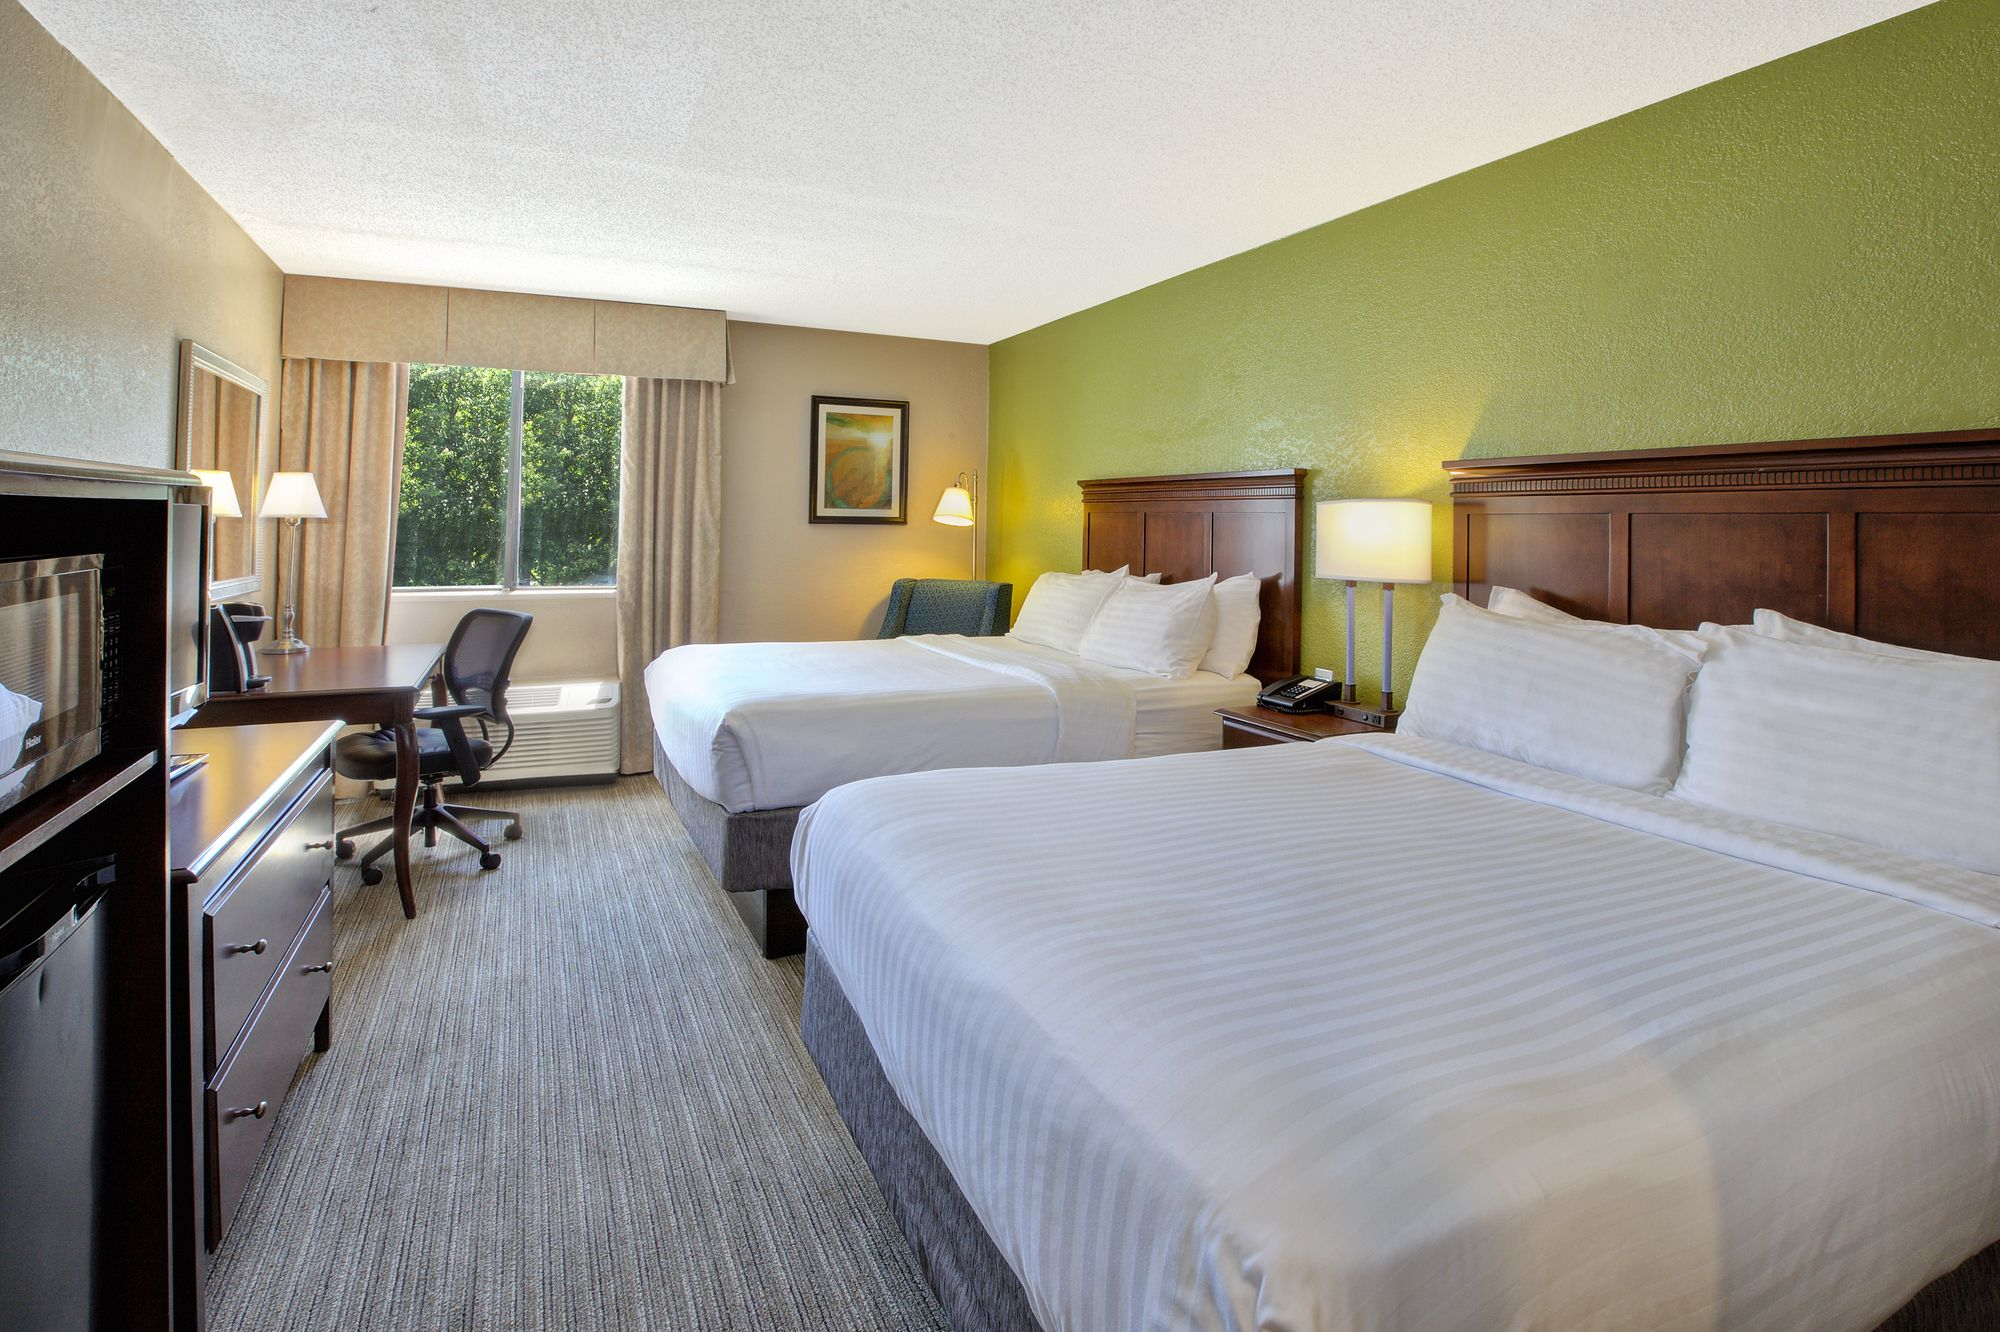 Holiday Inn Express Hotel & Suites Germantown-Gaithersburg in Germantown, MD